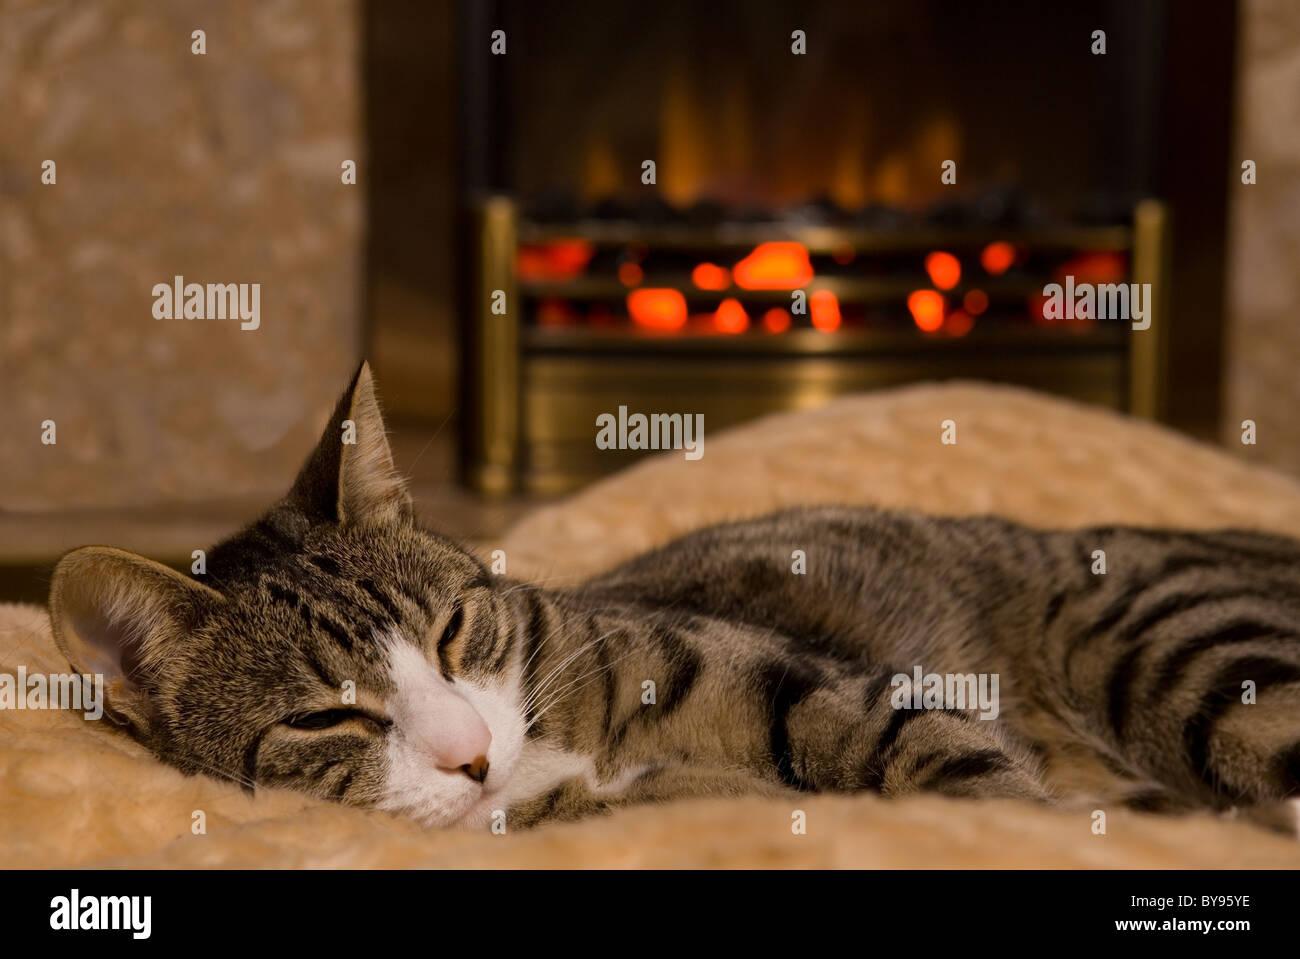 Gato durmiendo por fuego sola hembra adulta moggy gato adentro Imagen De Stock